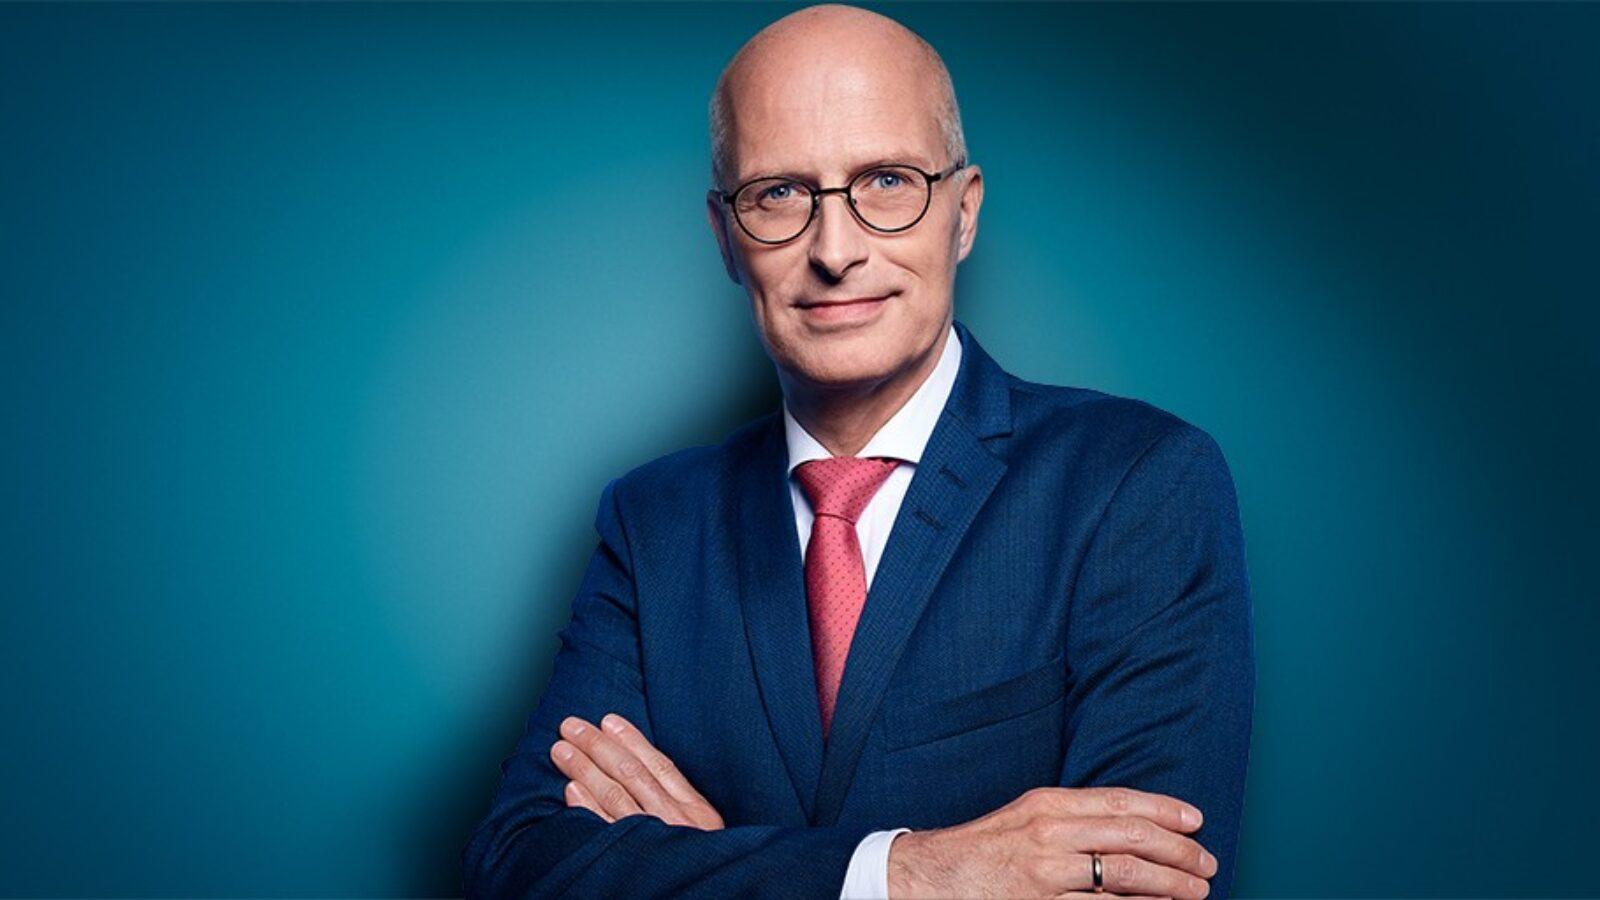 OXMOX Parteien-Check: SPD – Bürgerschaftswahl Hamburg 23. Februar